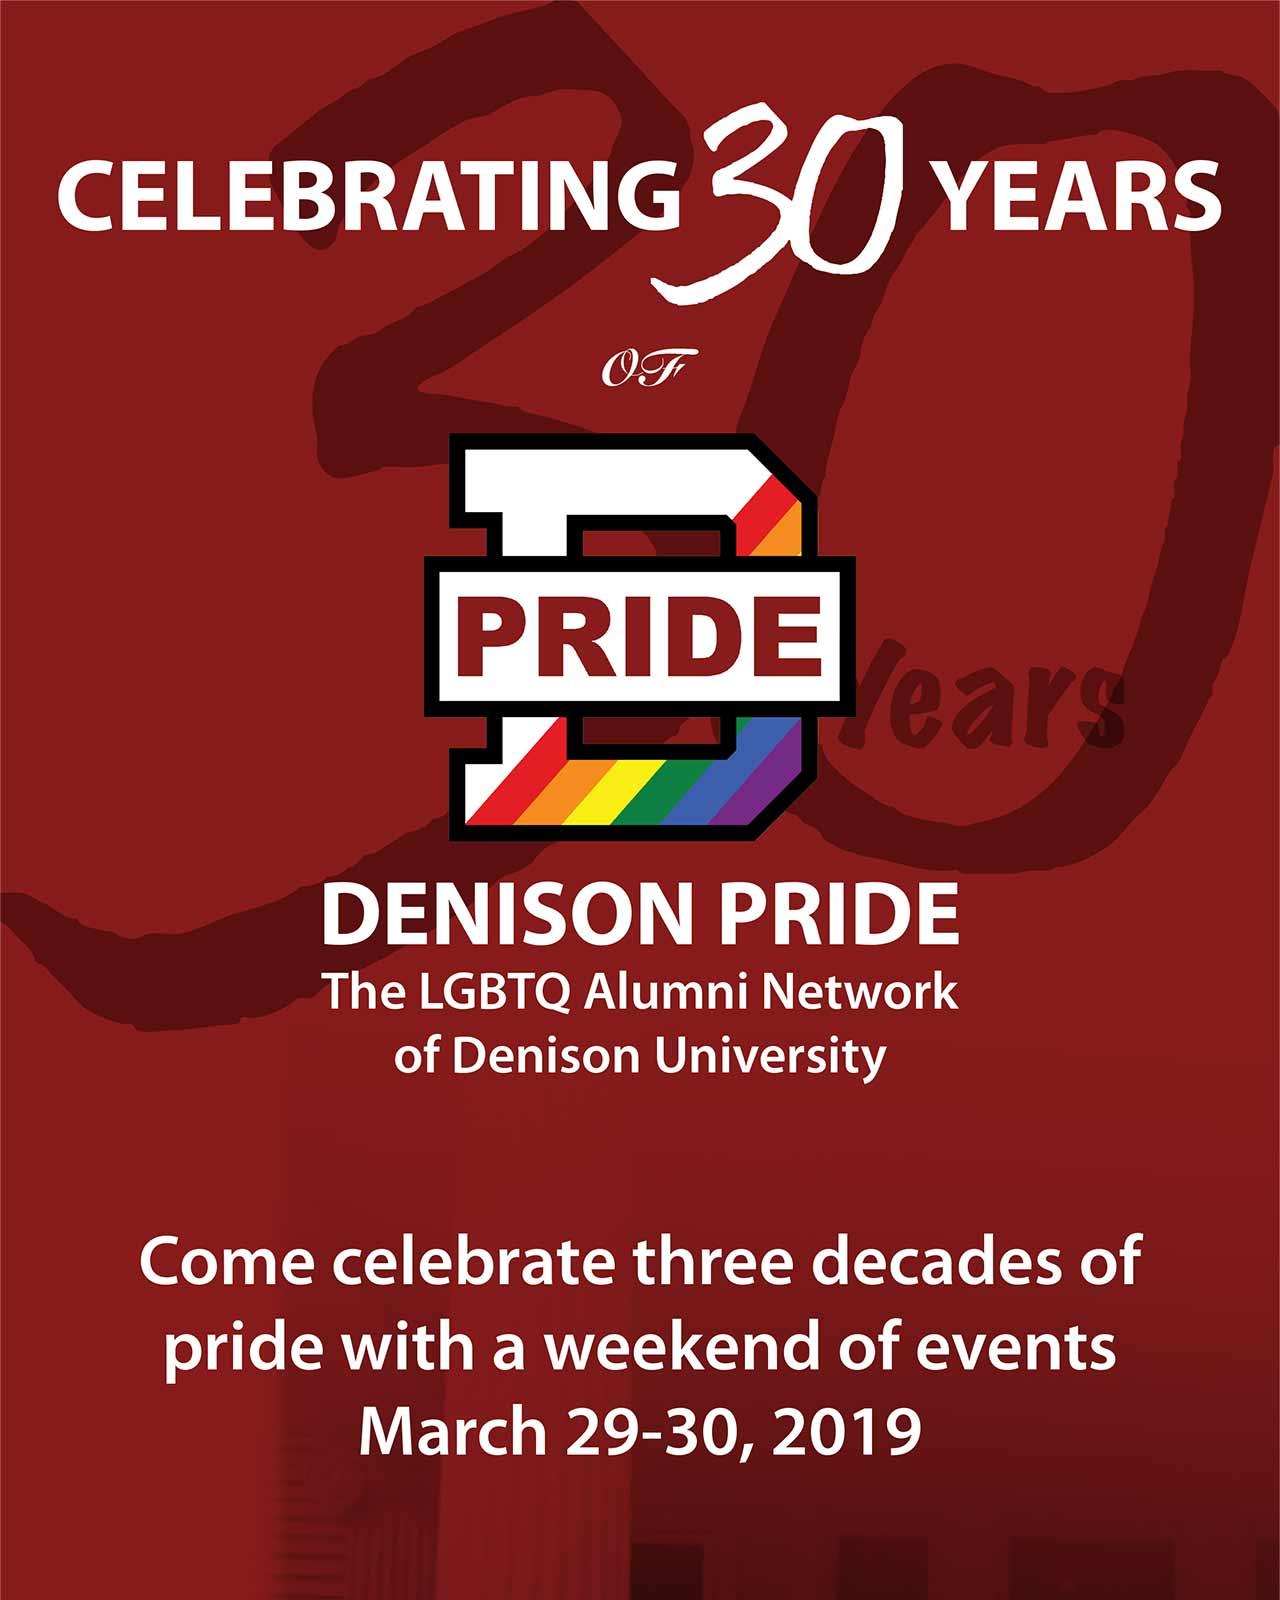 Denison Pride 30